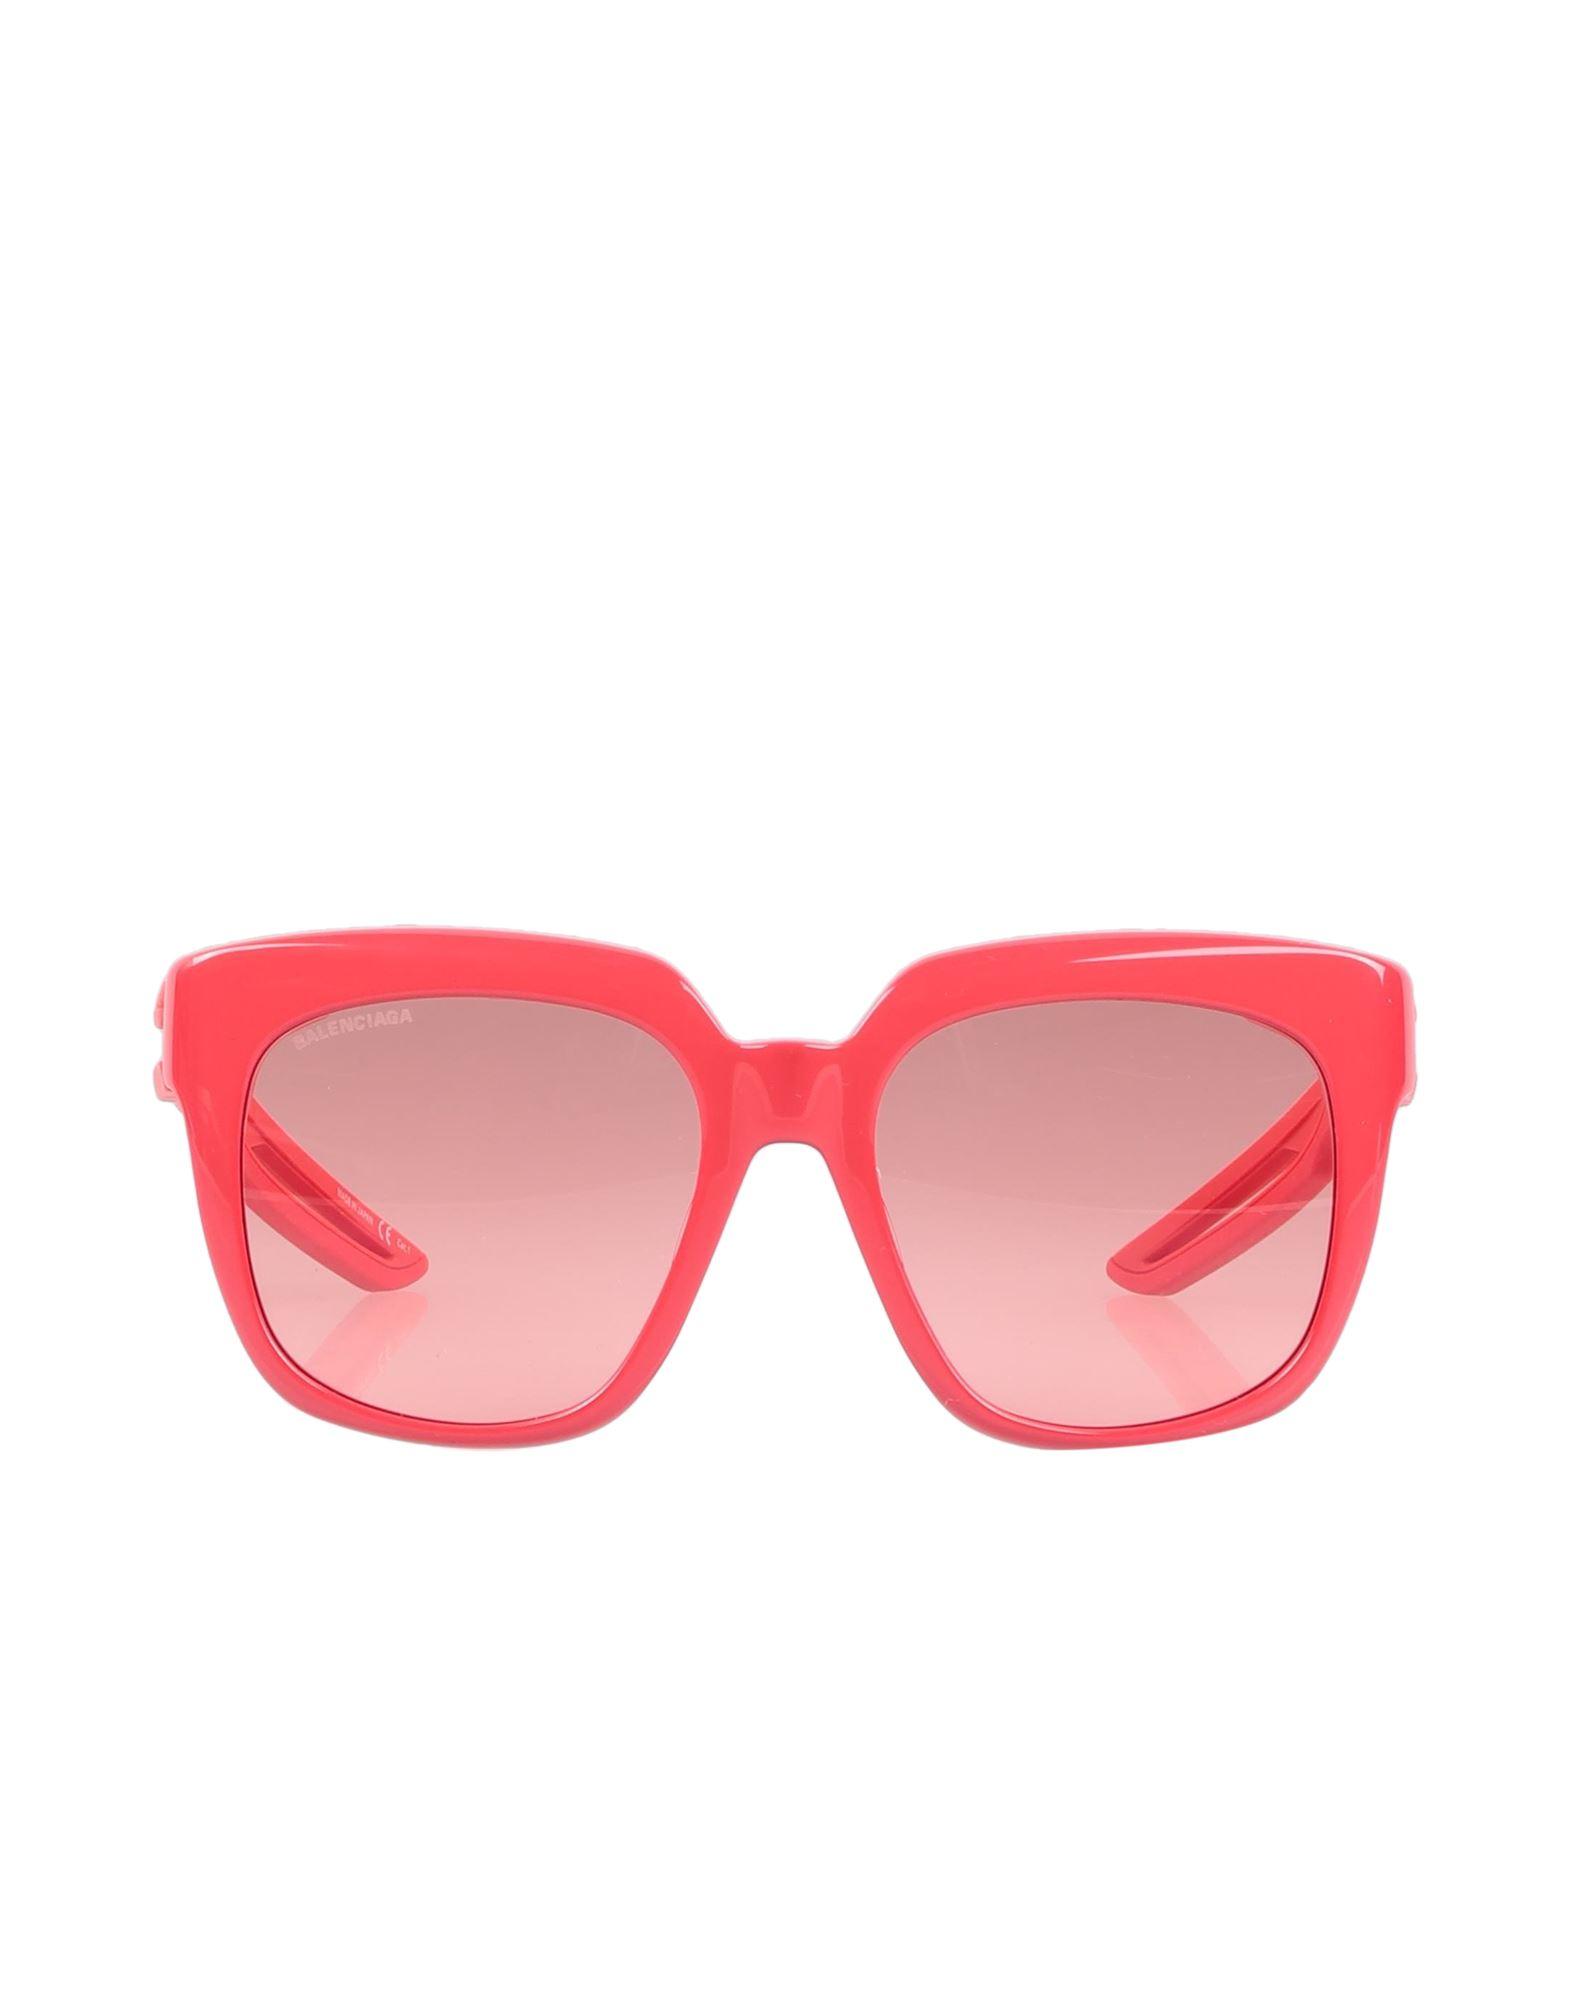 BALENCIAGA Sunglasses - Item 46735203